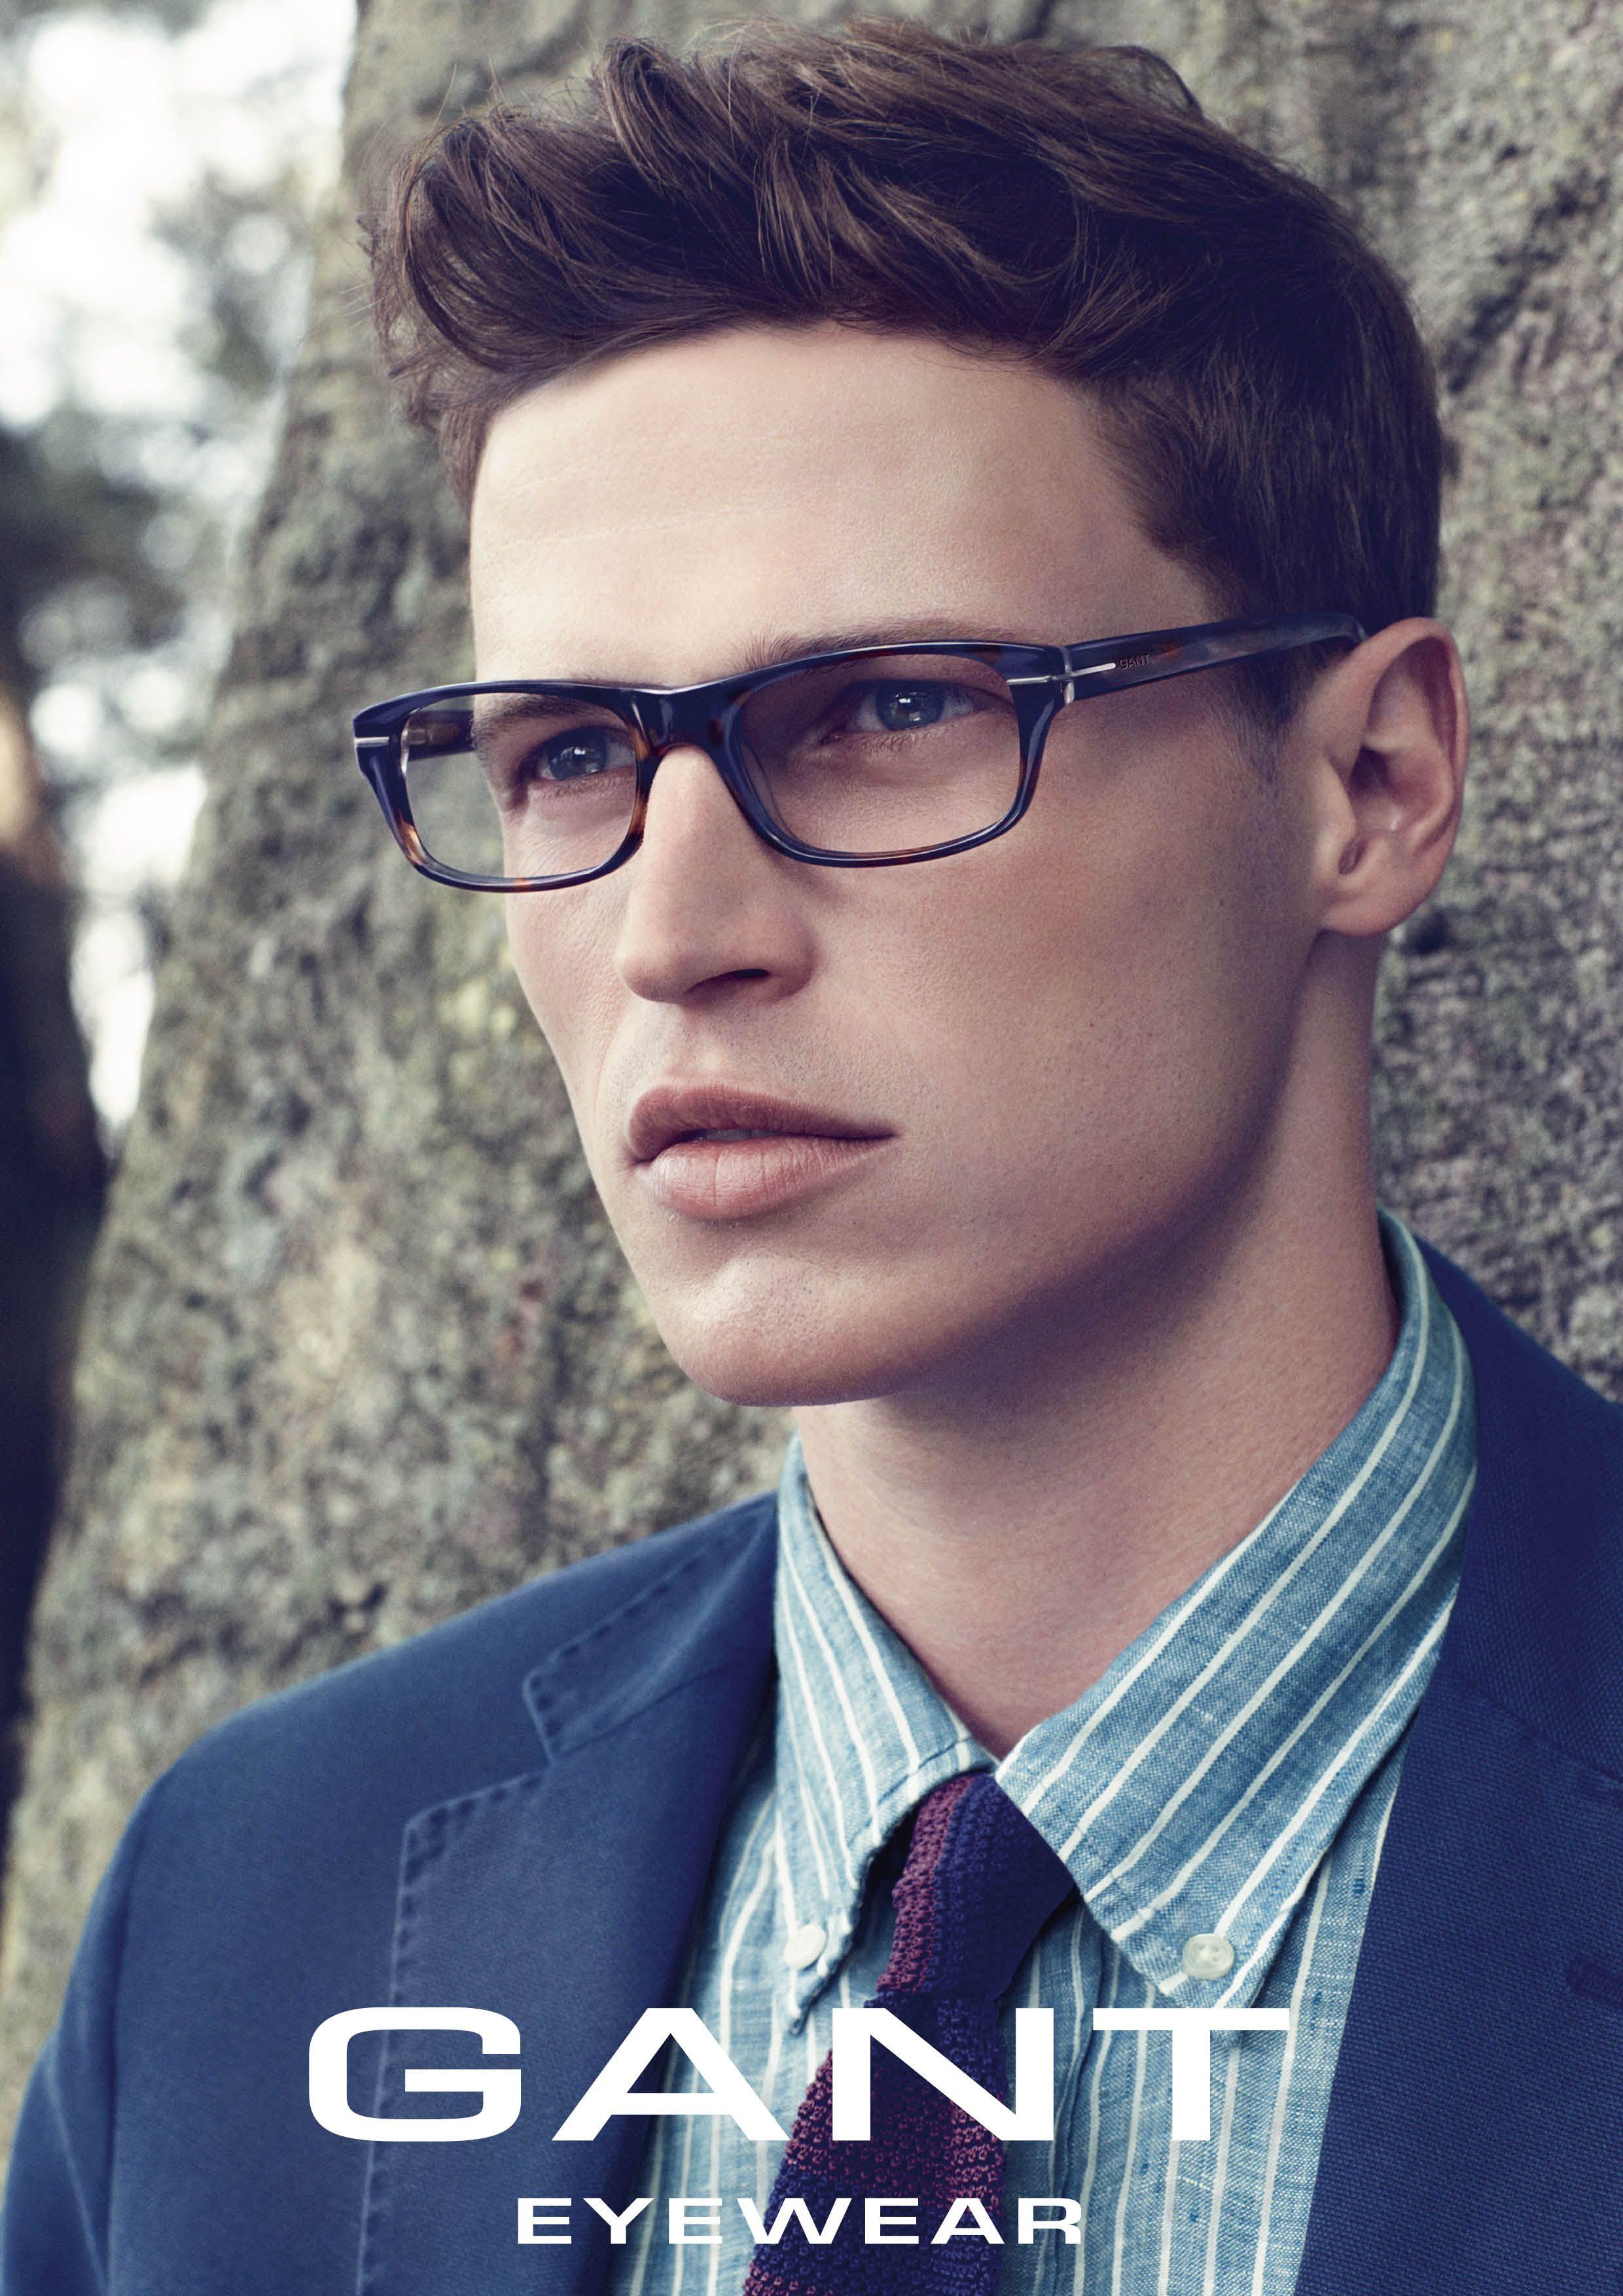 550ec29b55e Gant Eyewear now available at Glasses Galore